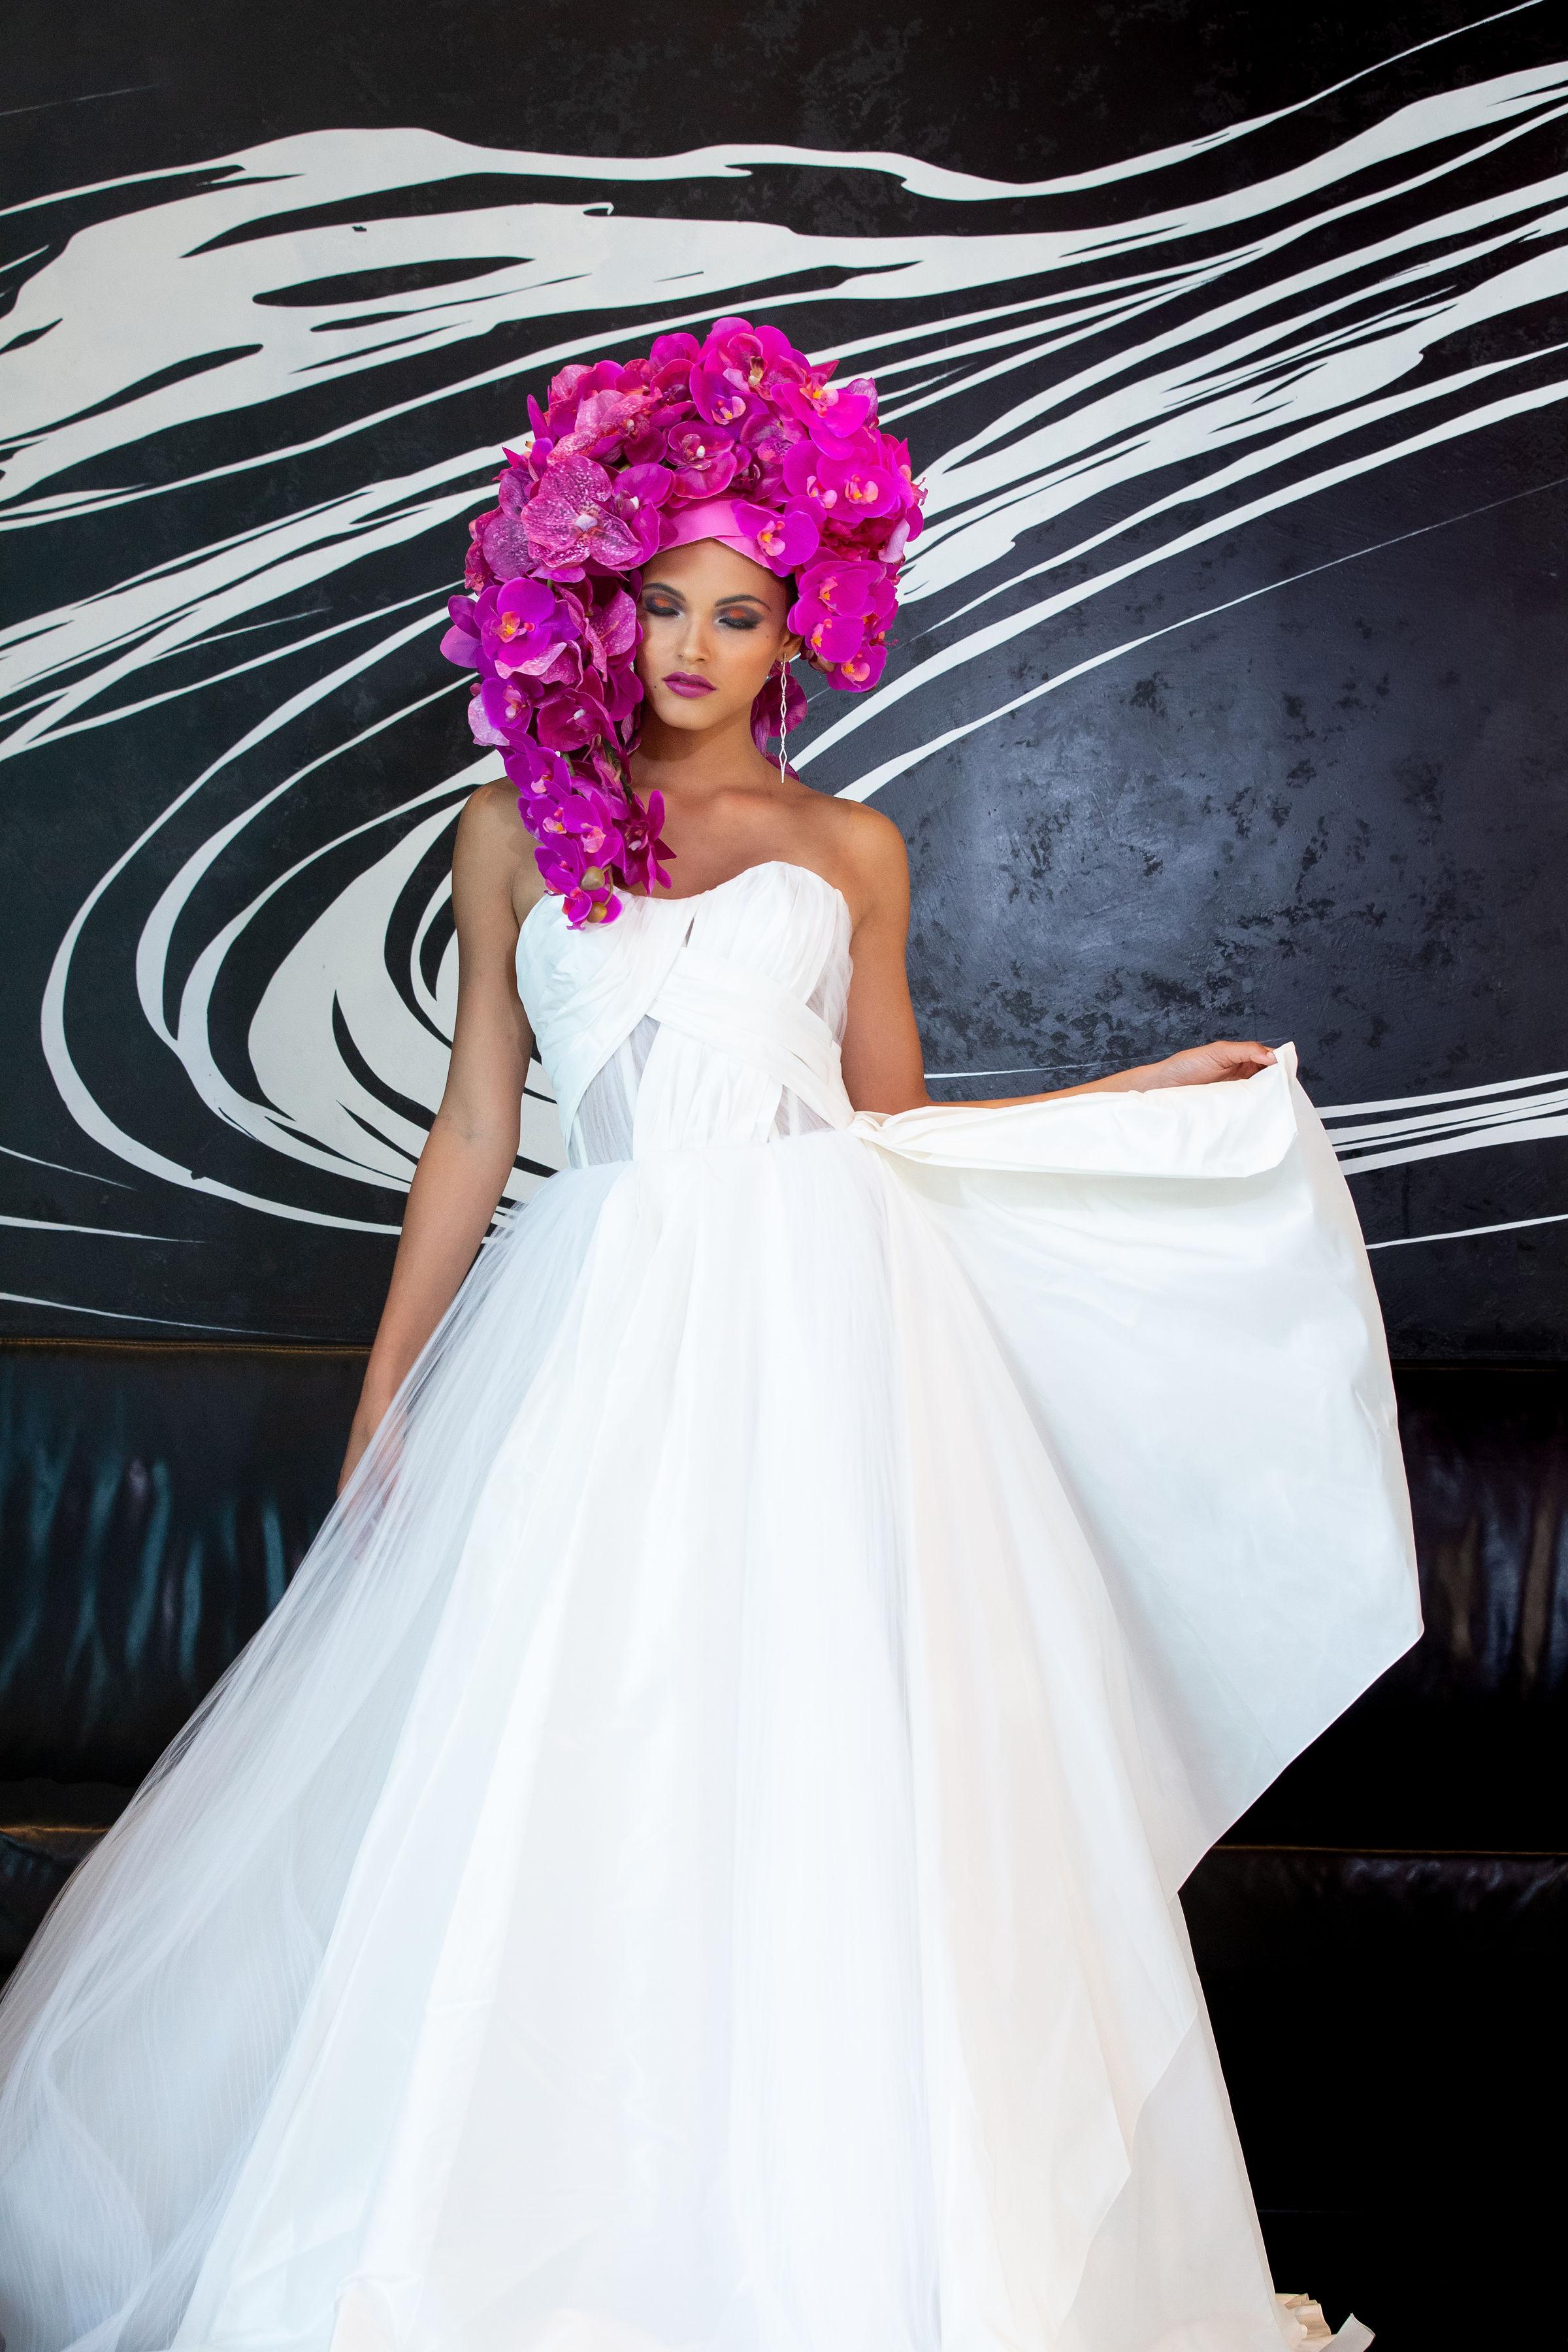 Angel-Sanche-dress-1-4-eyes-photo-004.jpg